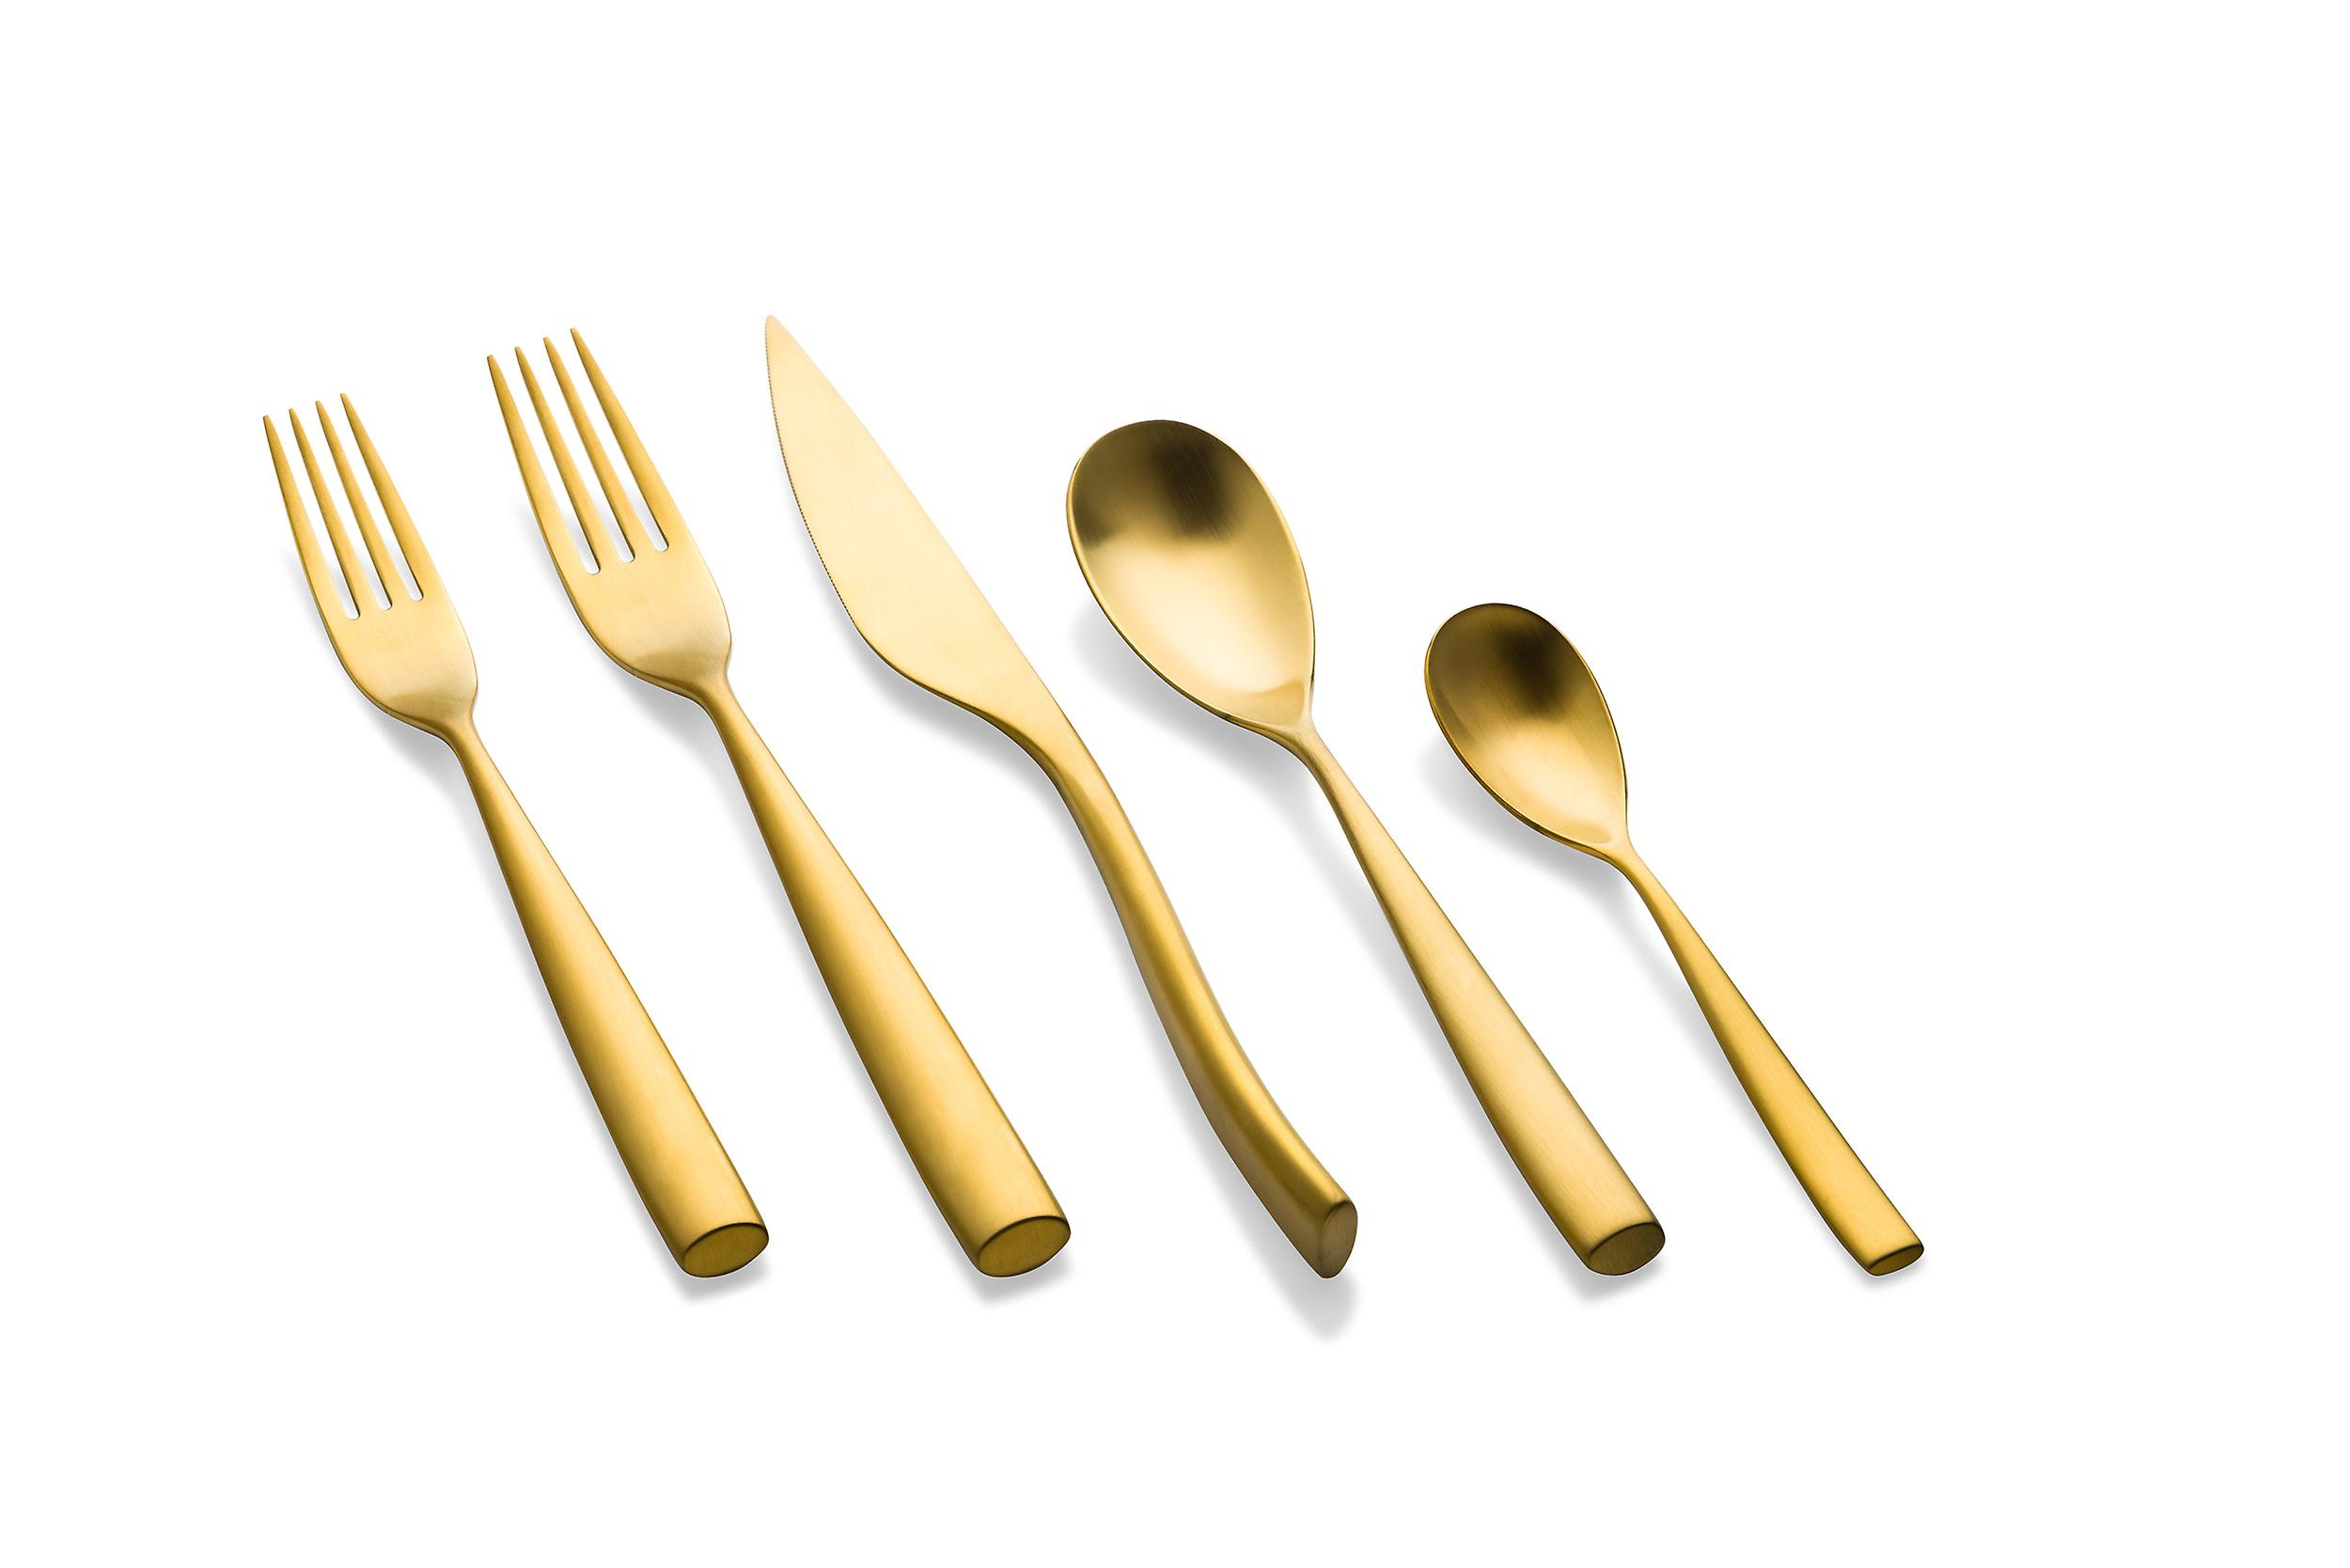 Mepra Arte Ice Oro 5 pcs flatware set